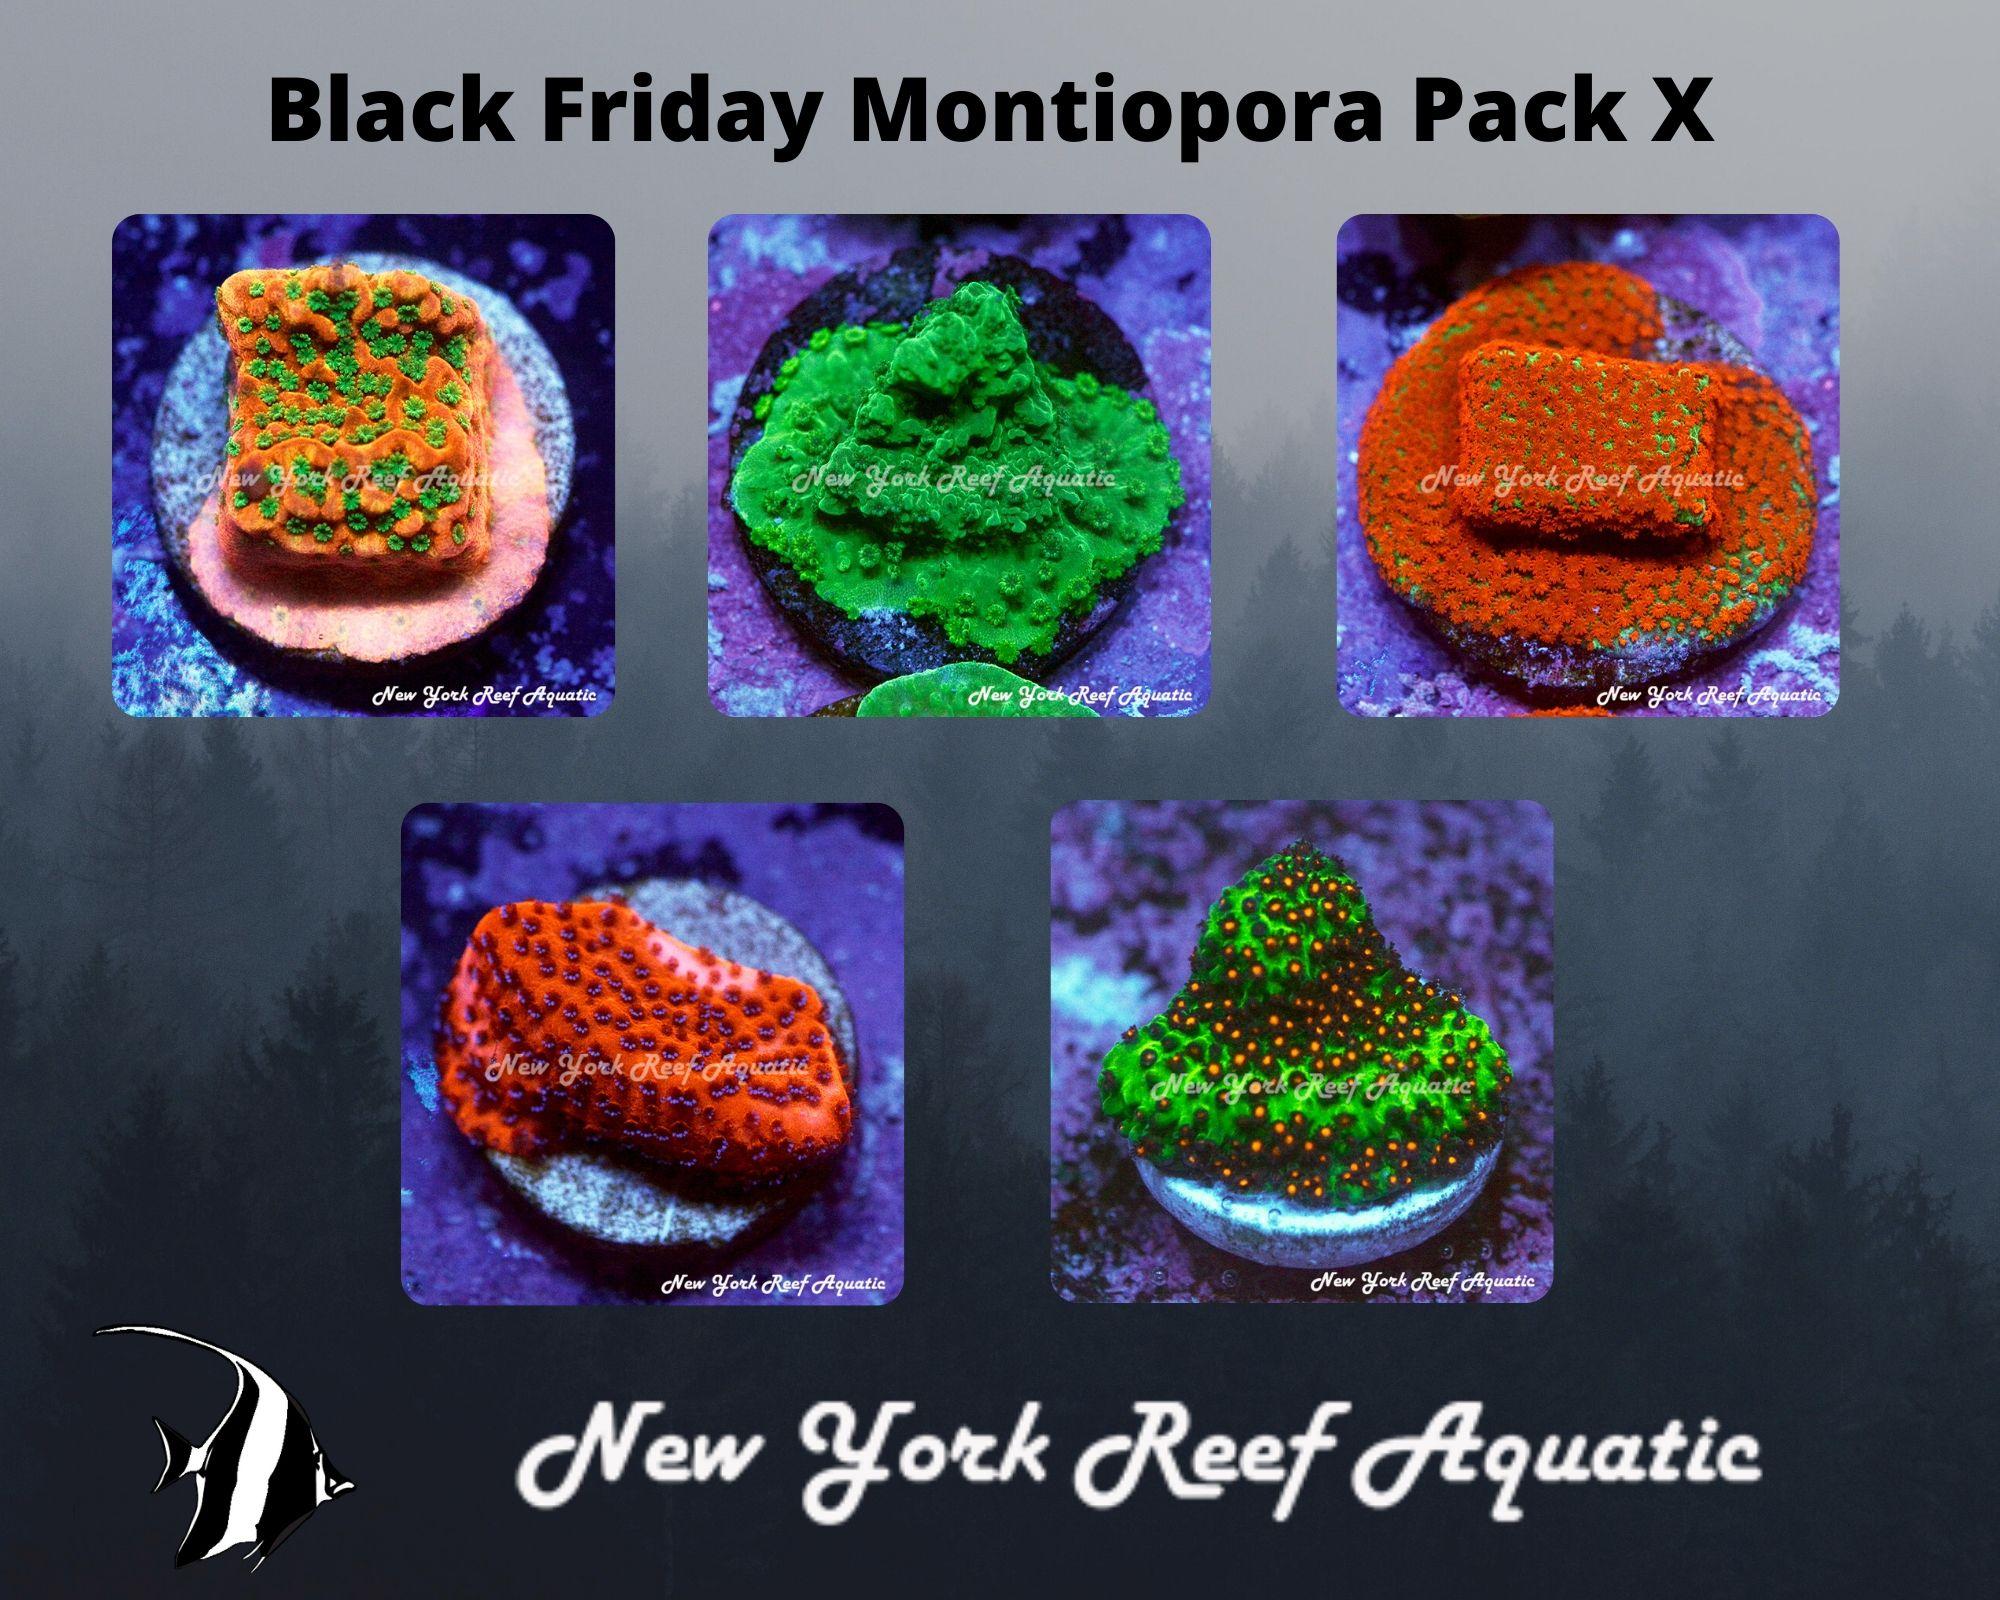 Montiopora Pack X.jpg